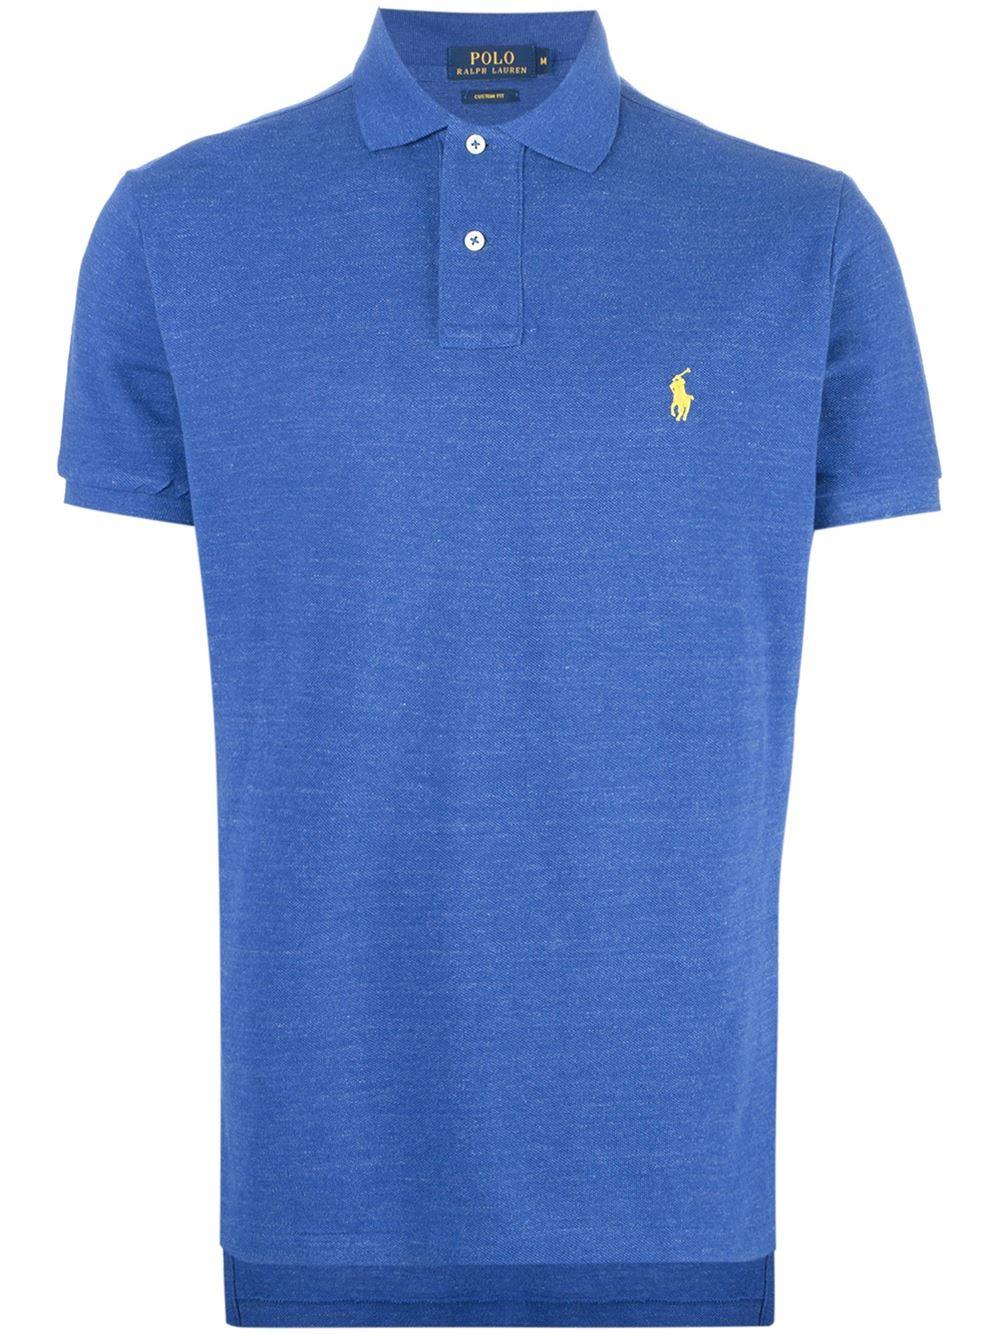 Polo ralph lauren custom fit polo shirt in blue for men lyst for Polo ralph lauren custom fit polo shirt